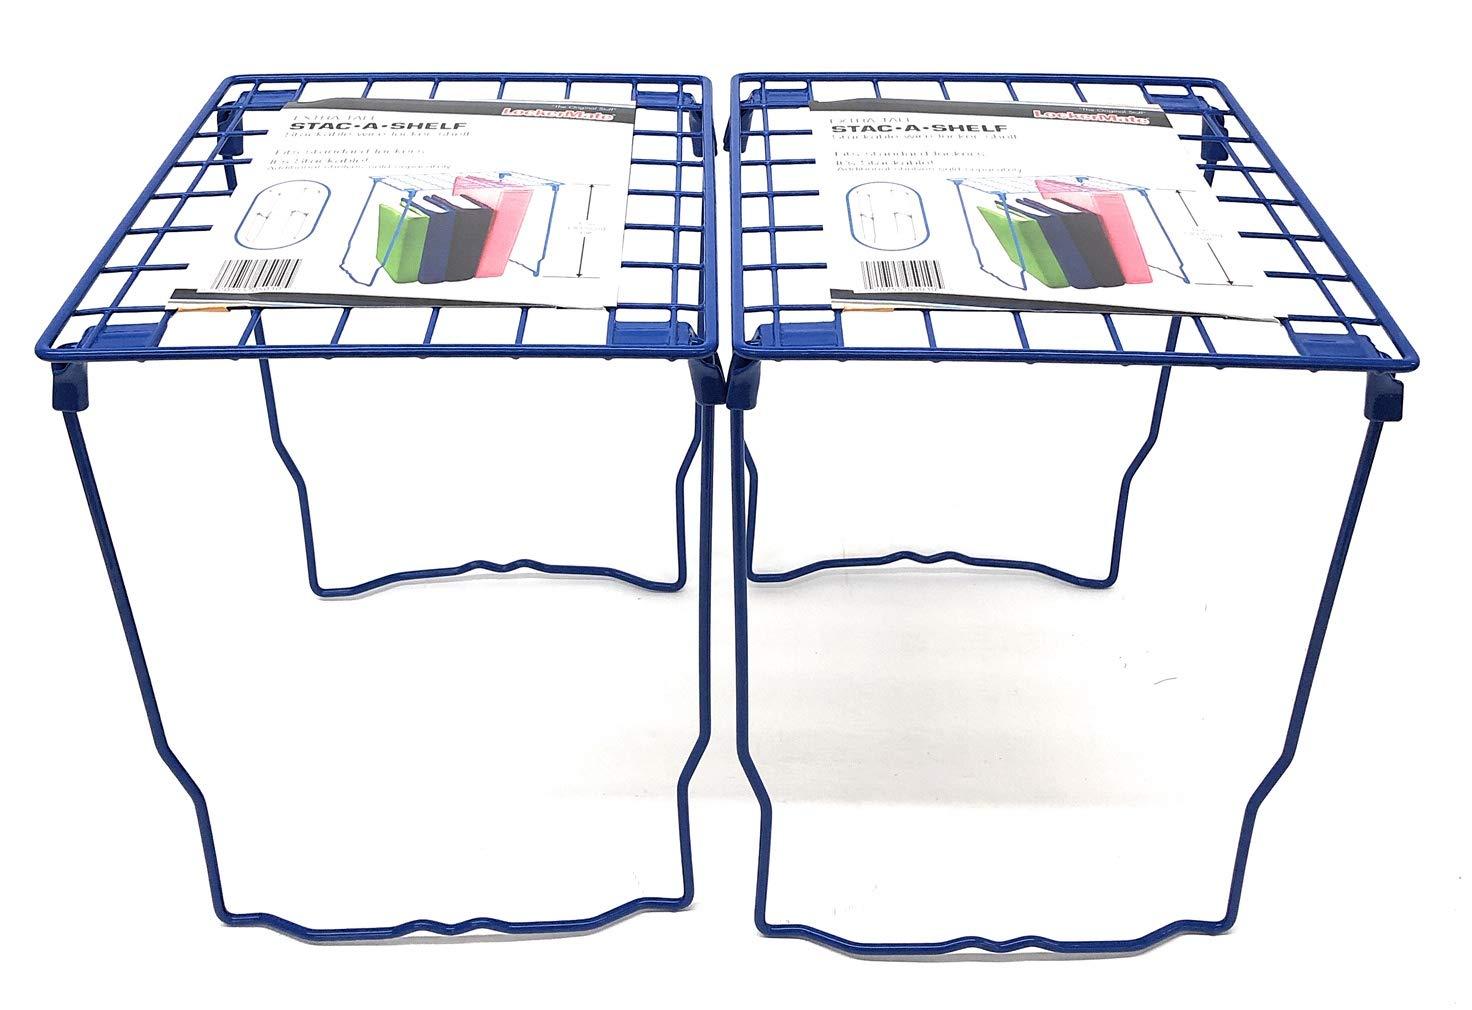 2-Pack, Blue Lockermate Stac-a-Shelf 12 Locker Shelf